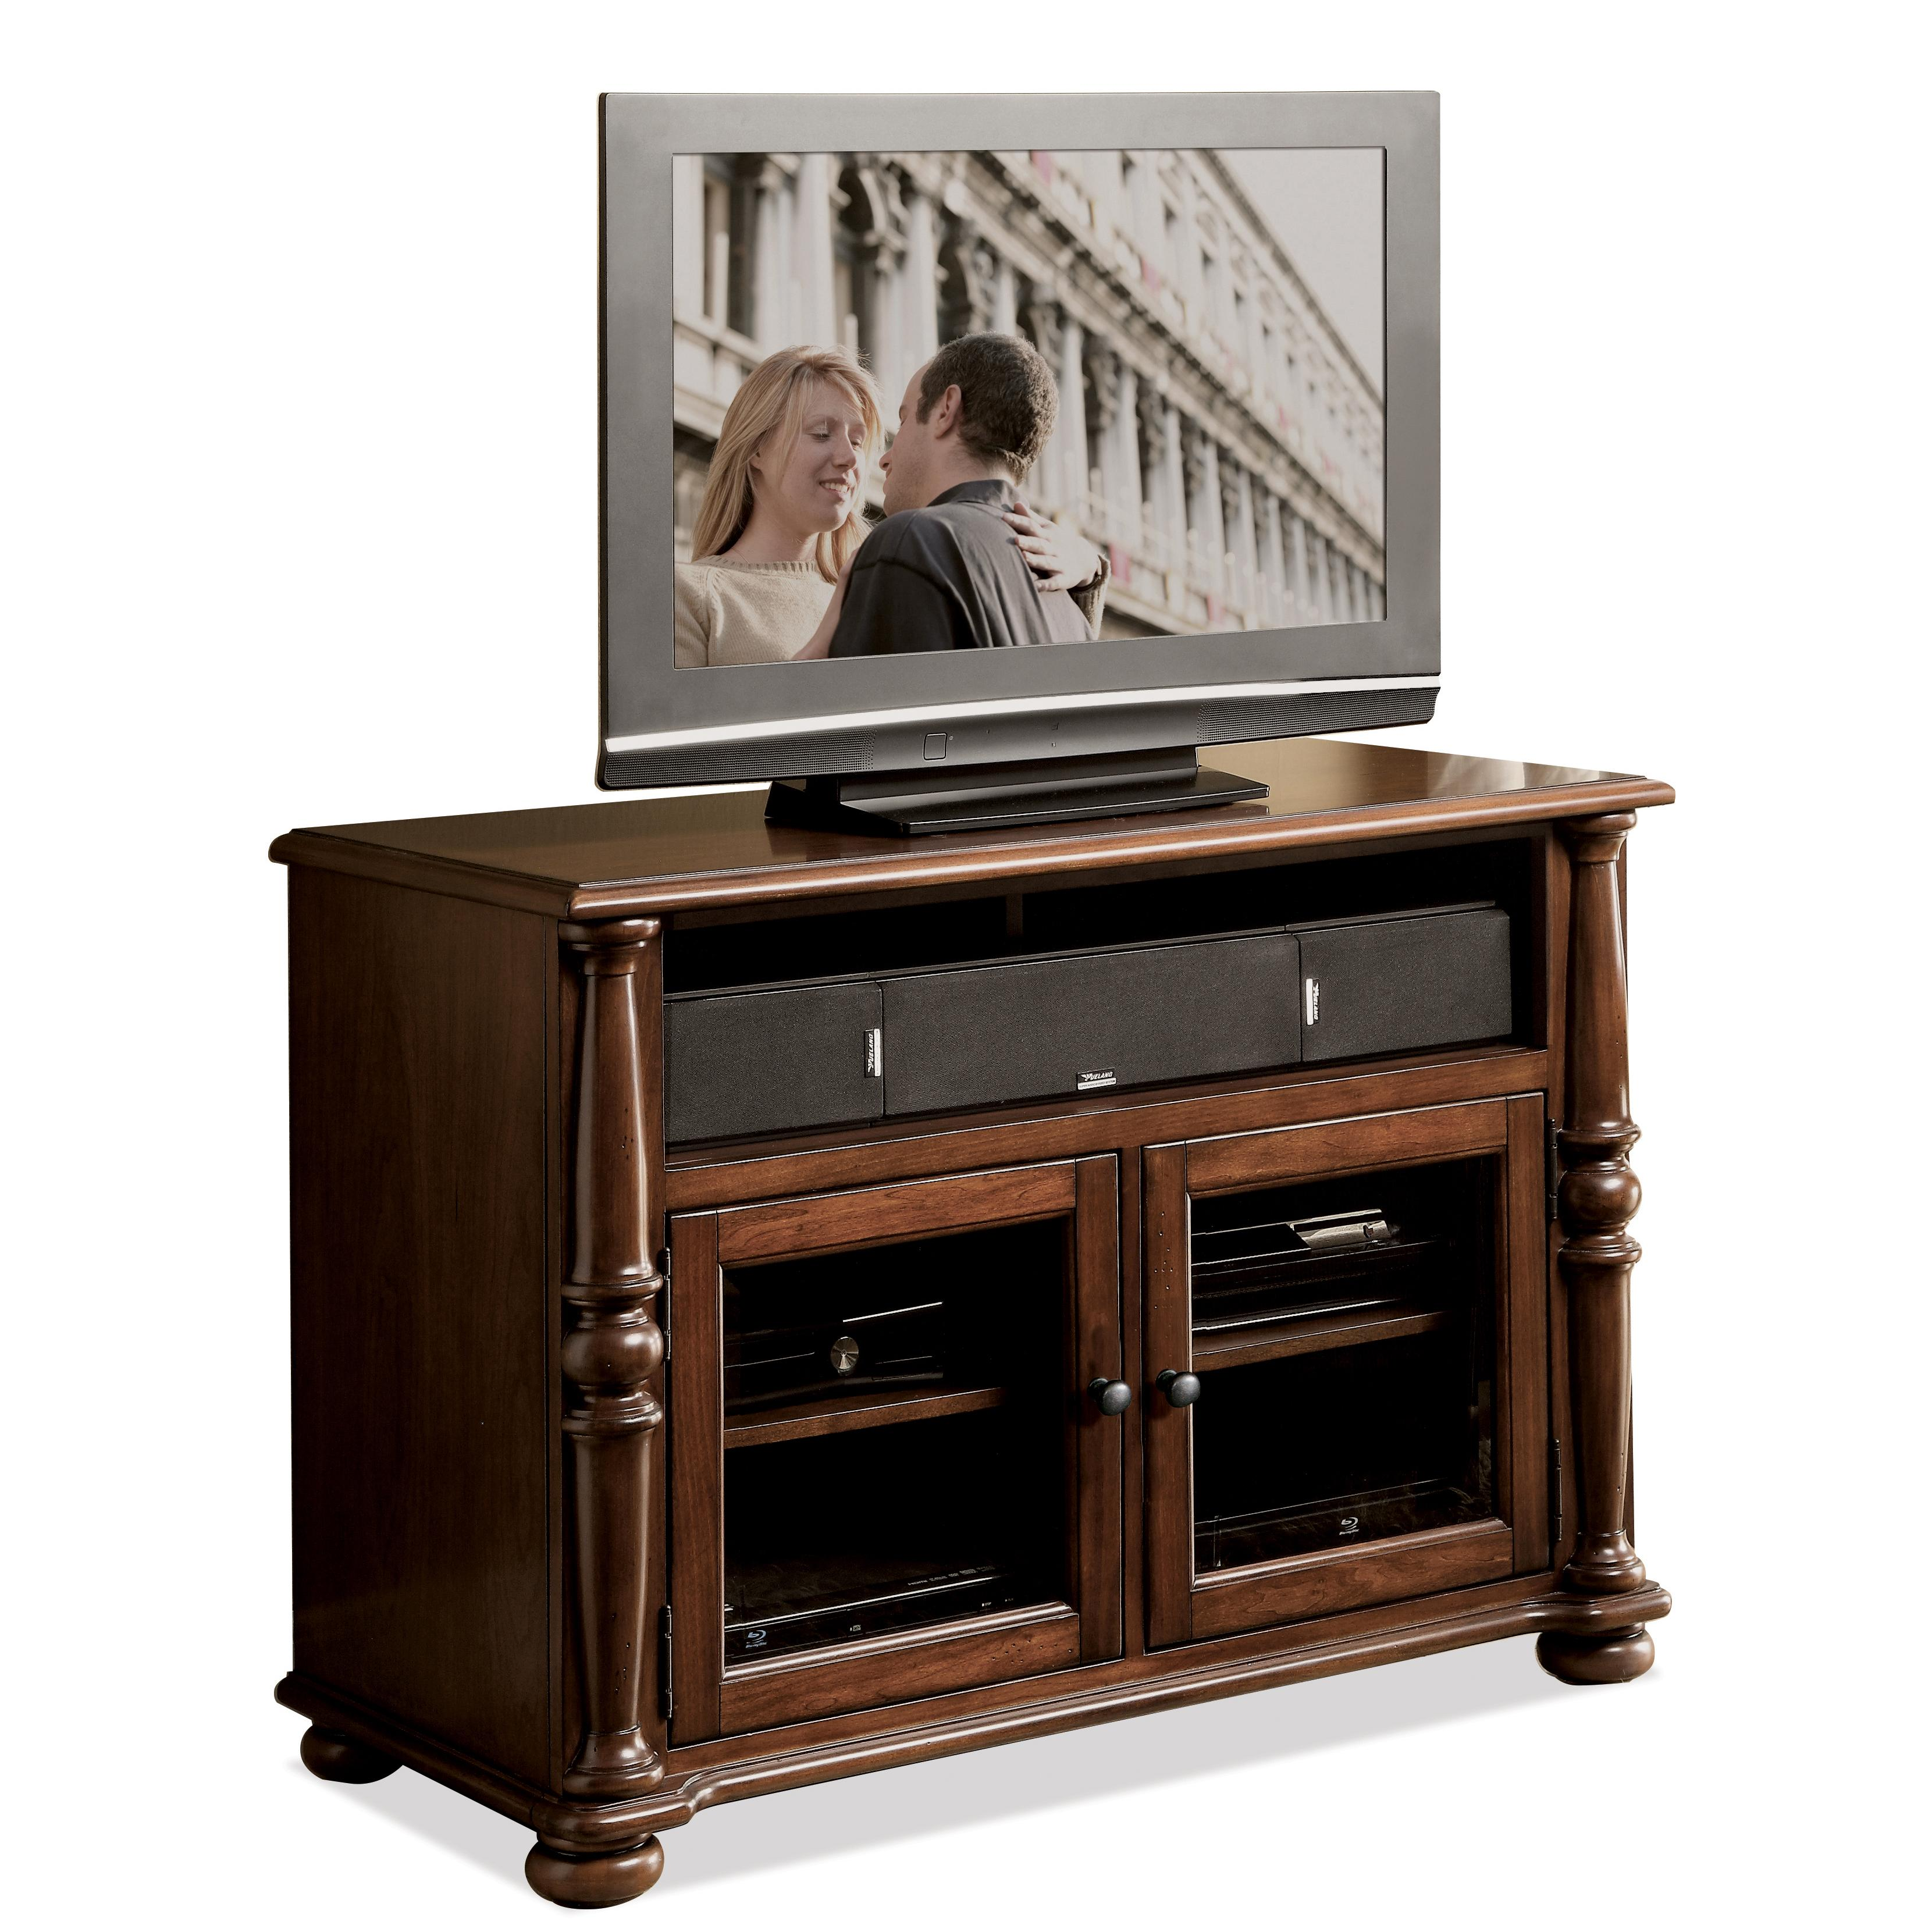 Riverside Furniture Dunmore TV Console - Item Number: 65642